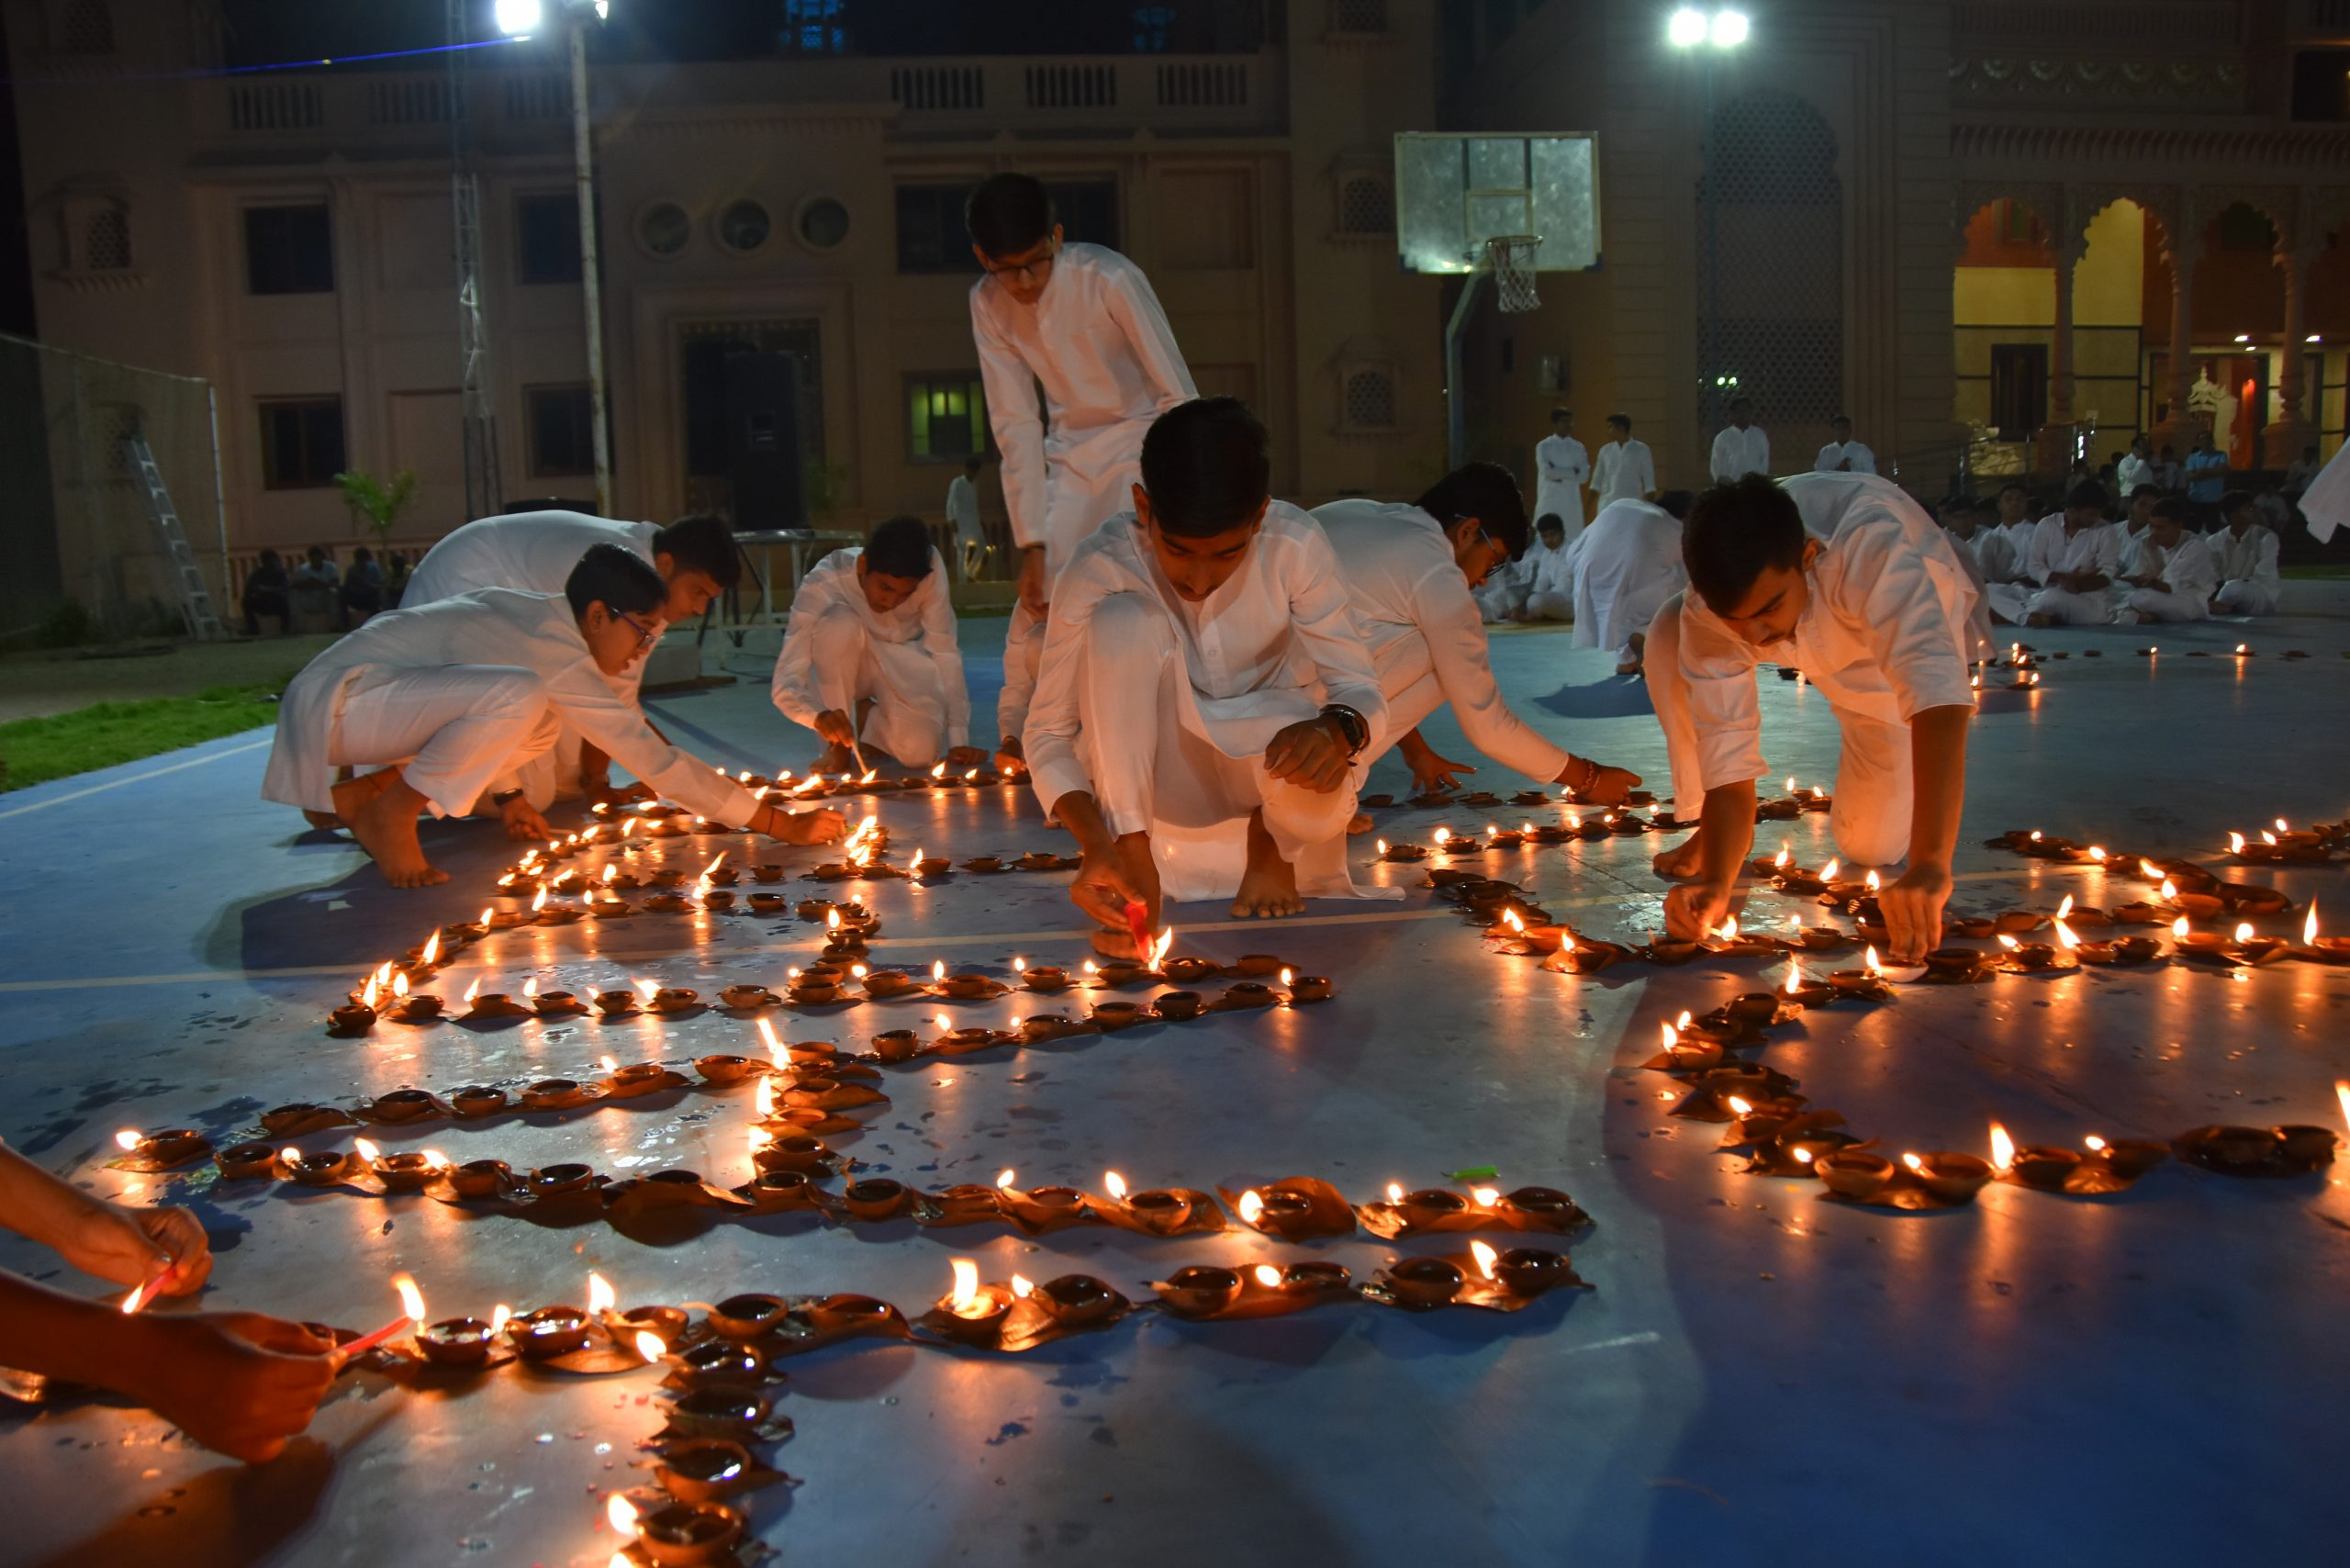 SHREE NEELAKANTH VIDYAPEETH Students Celebrating Diwali